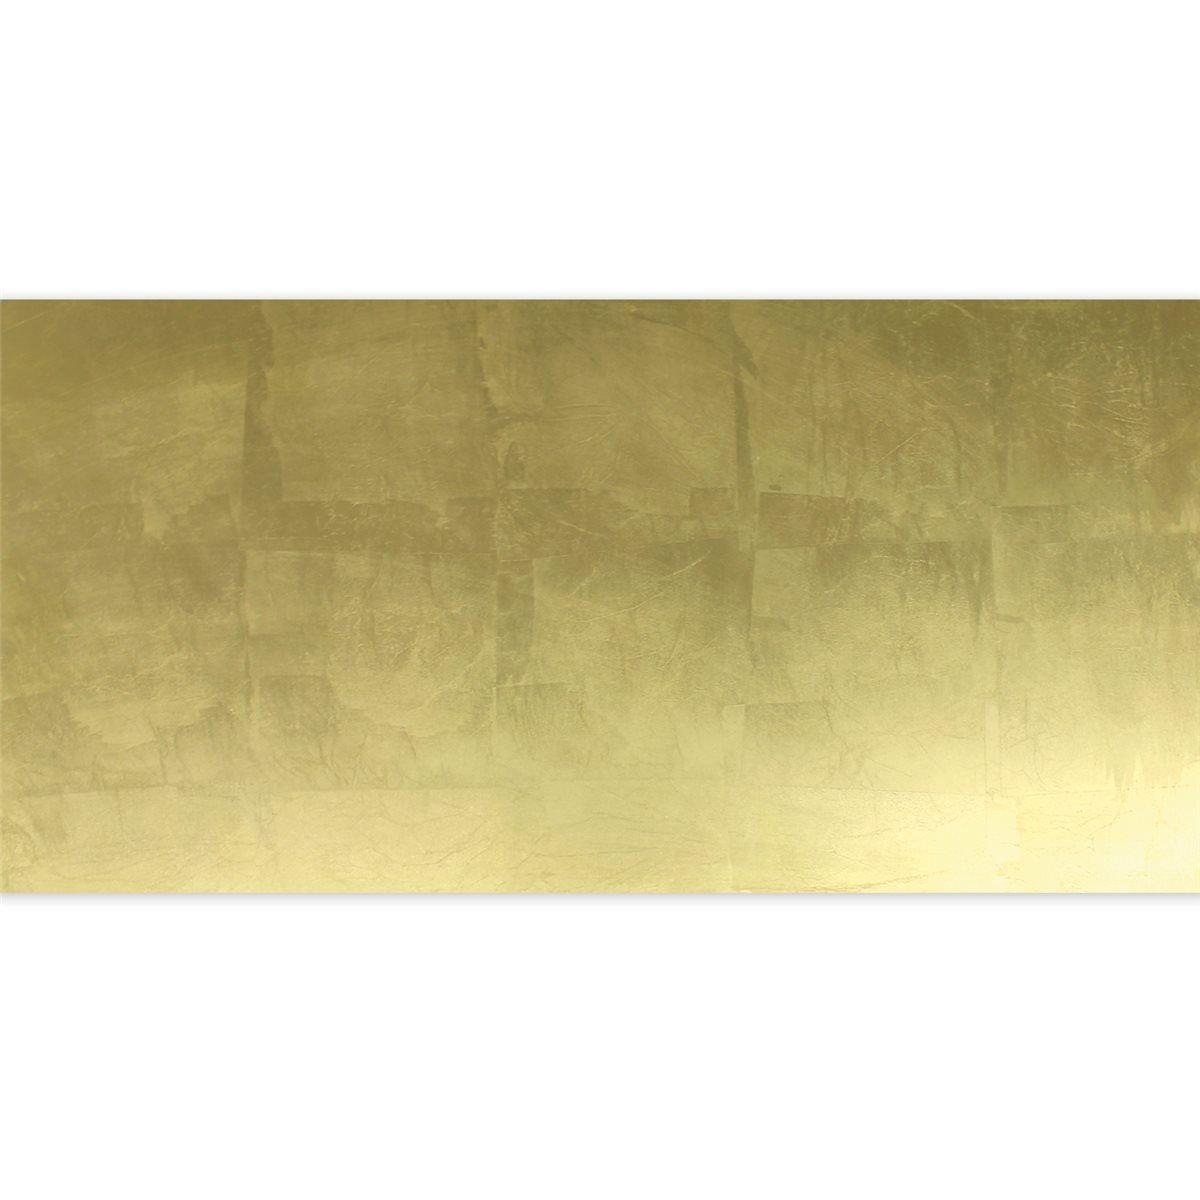 Glasfliese Dekor Gold Metall Effekt 30x60cm